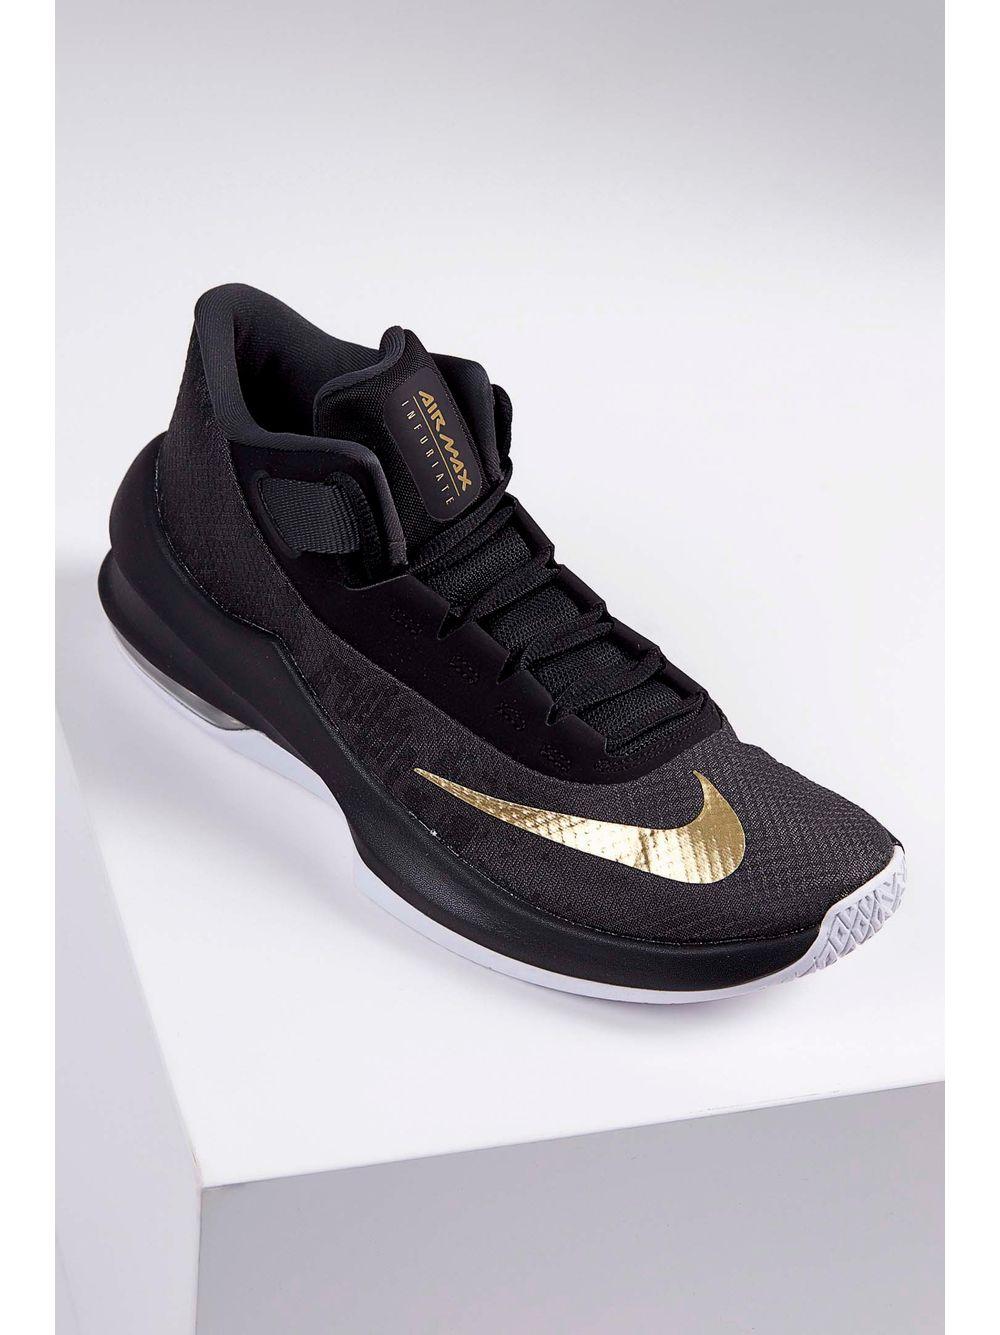 12ae9afed3 Previous. Tenis-Nike-Air-Max-Infuriate-2-Mid-Preto ...